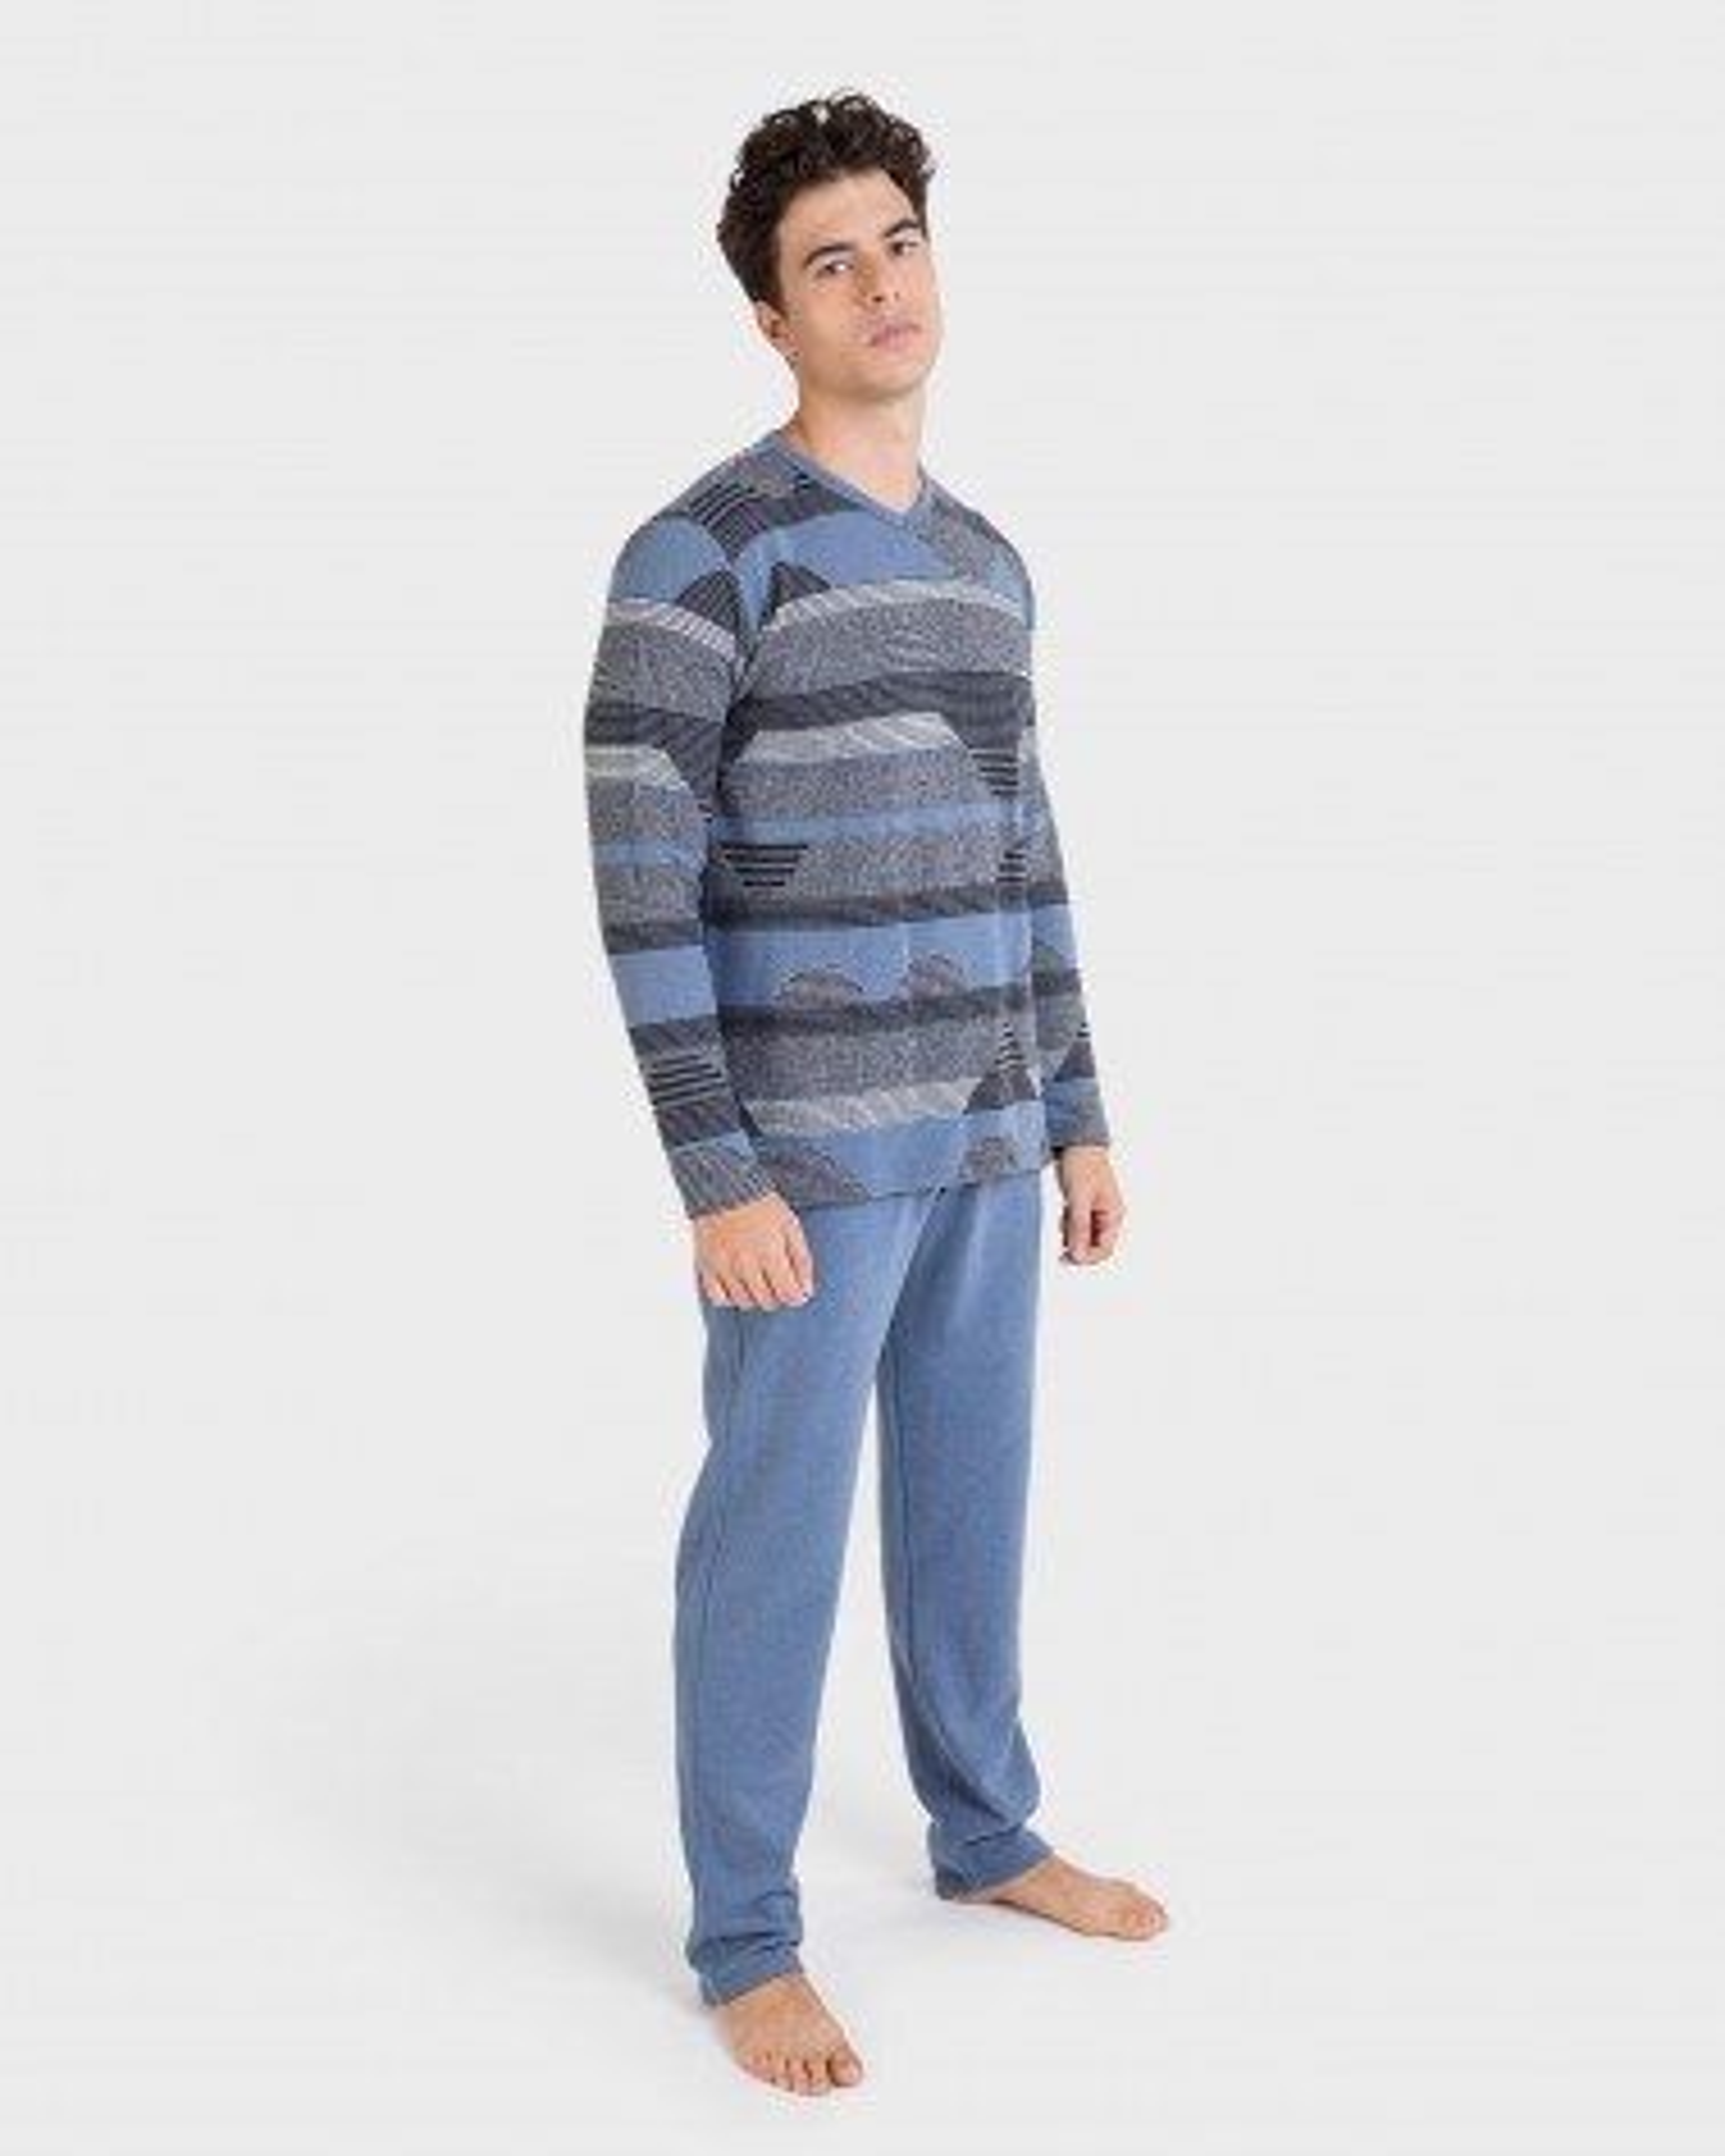 Pijama Caballero 'Vigoré Azul' Massana